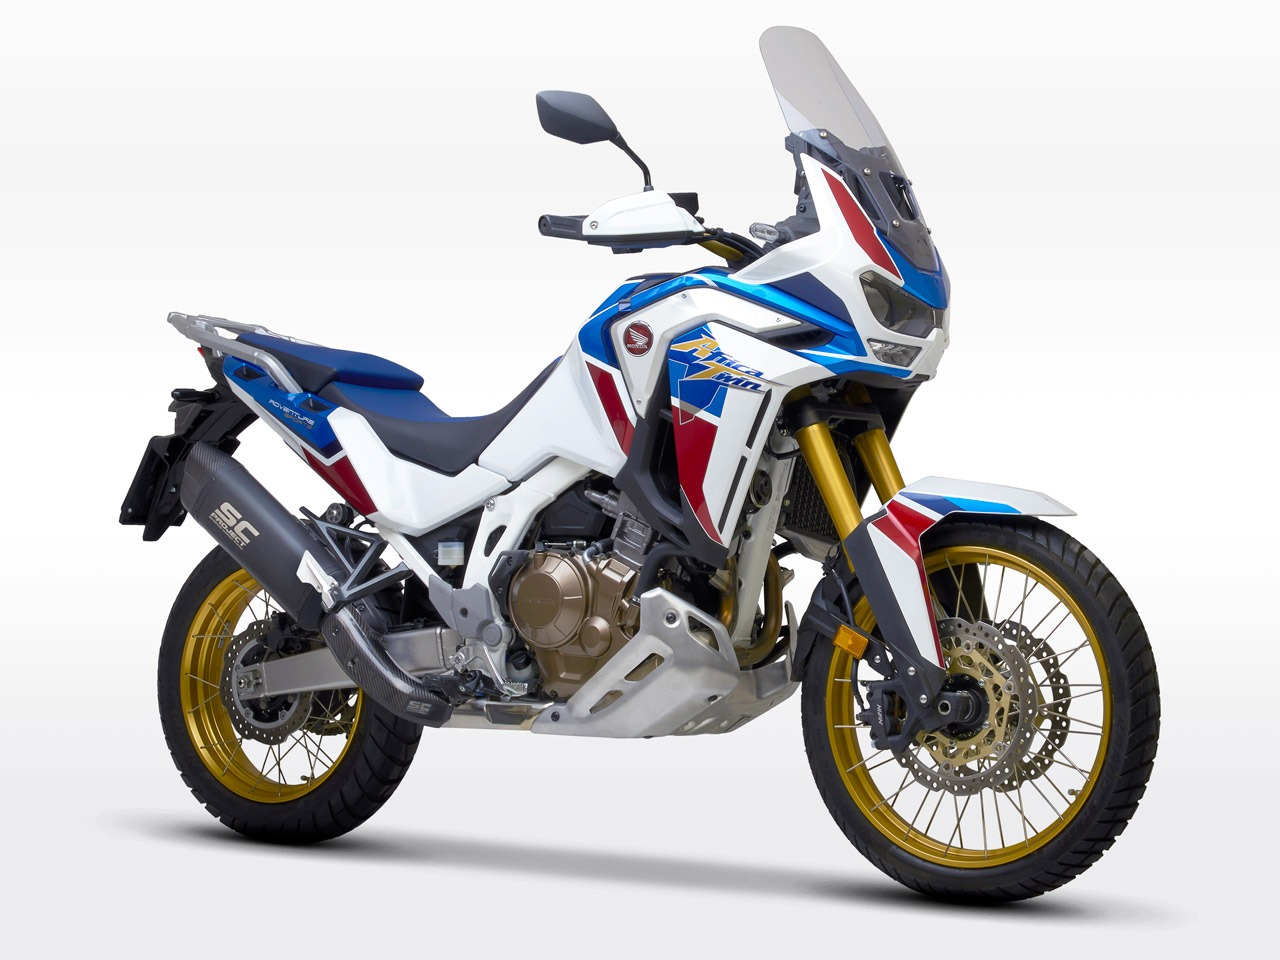 Honda_CRF1100L-AfricaTwin_my2021_Adventure-MattBlack_3-4Anteriore_1280x960px_web-partnership